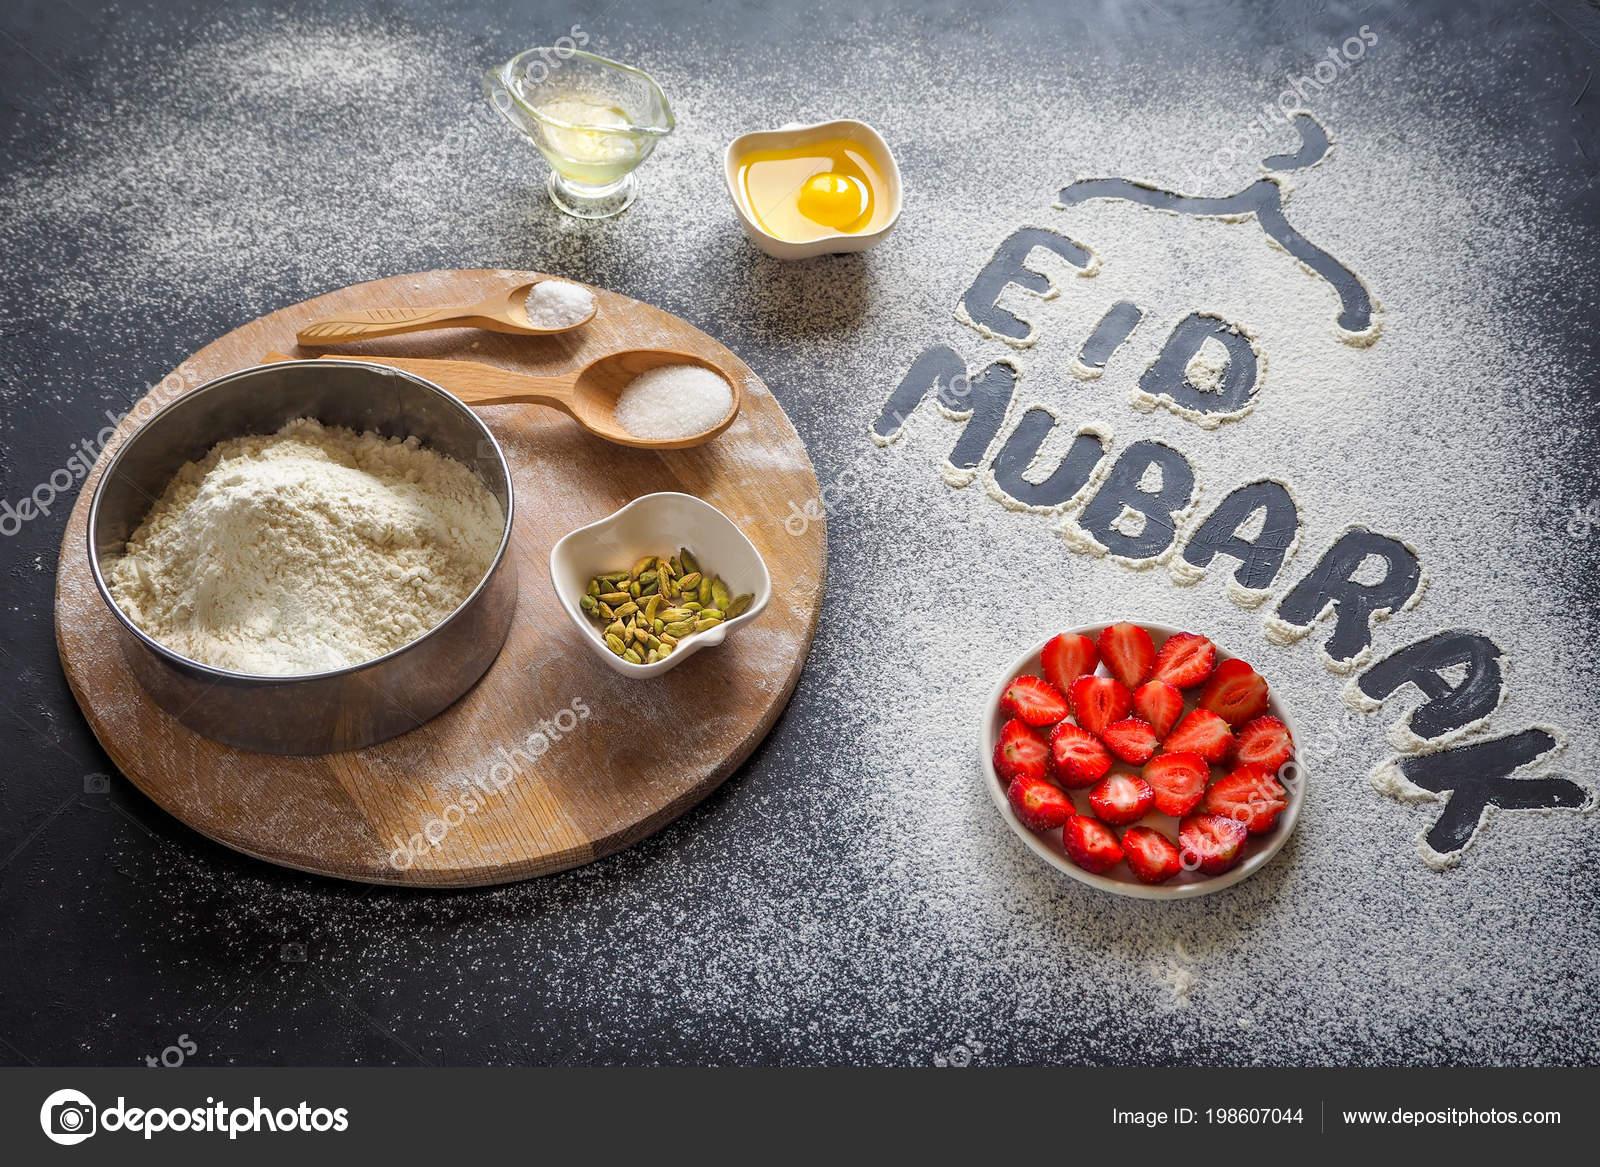 Eid mubarak islamic holiday welcome phrase happy holiday eid mubarak islamic holiday welcome phrase happy holiday greeting reserved strawberry open cake arabic cuisine background photo by sablinstanislav m4hsunfo